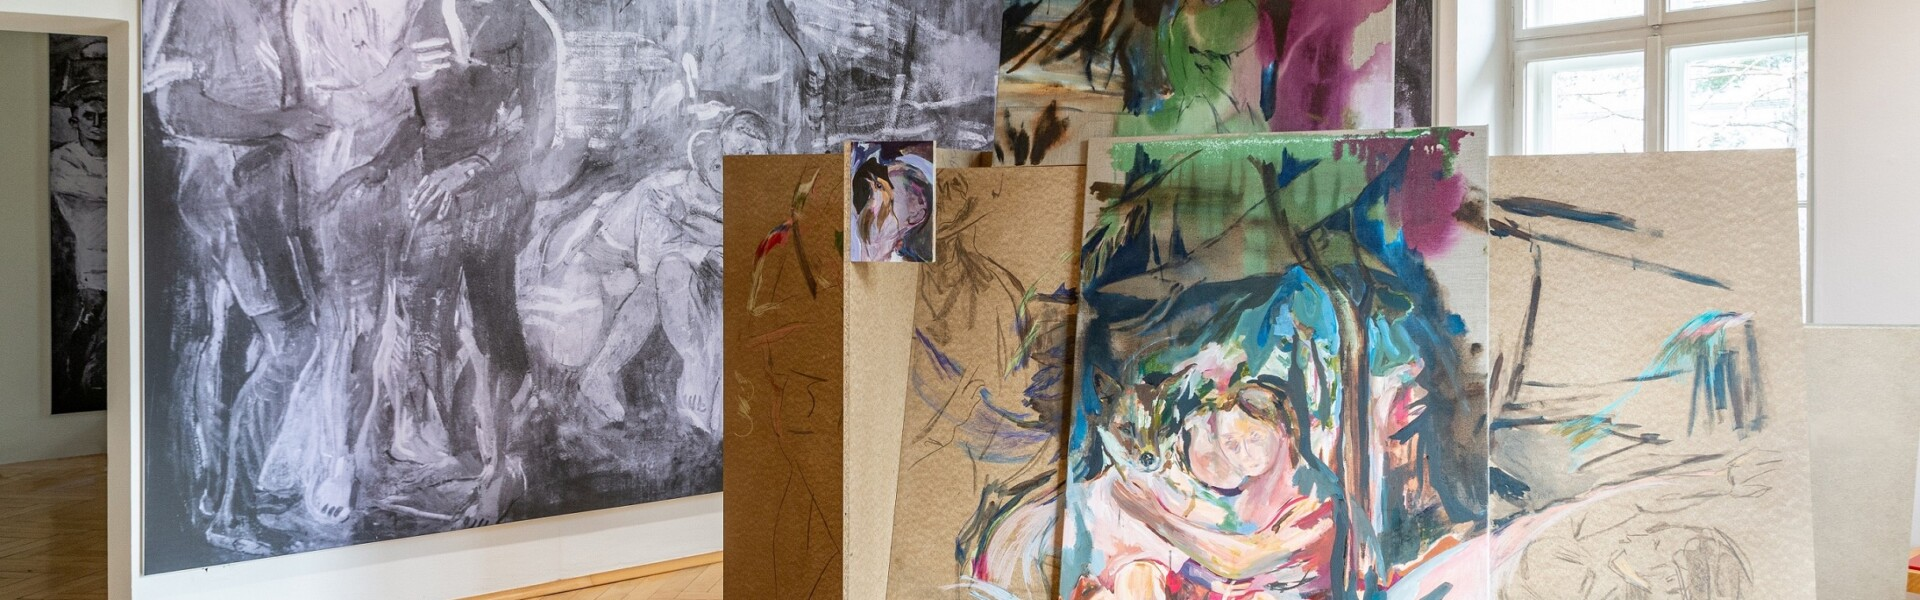 Museum des Nötscher Kreises, Raumansicht Ausstellung 2020, Foto: grafik.at